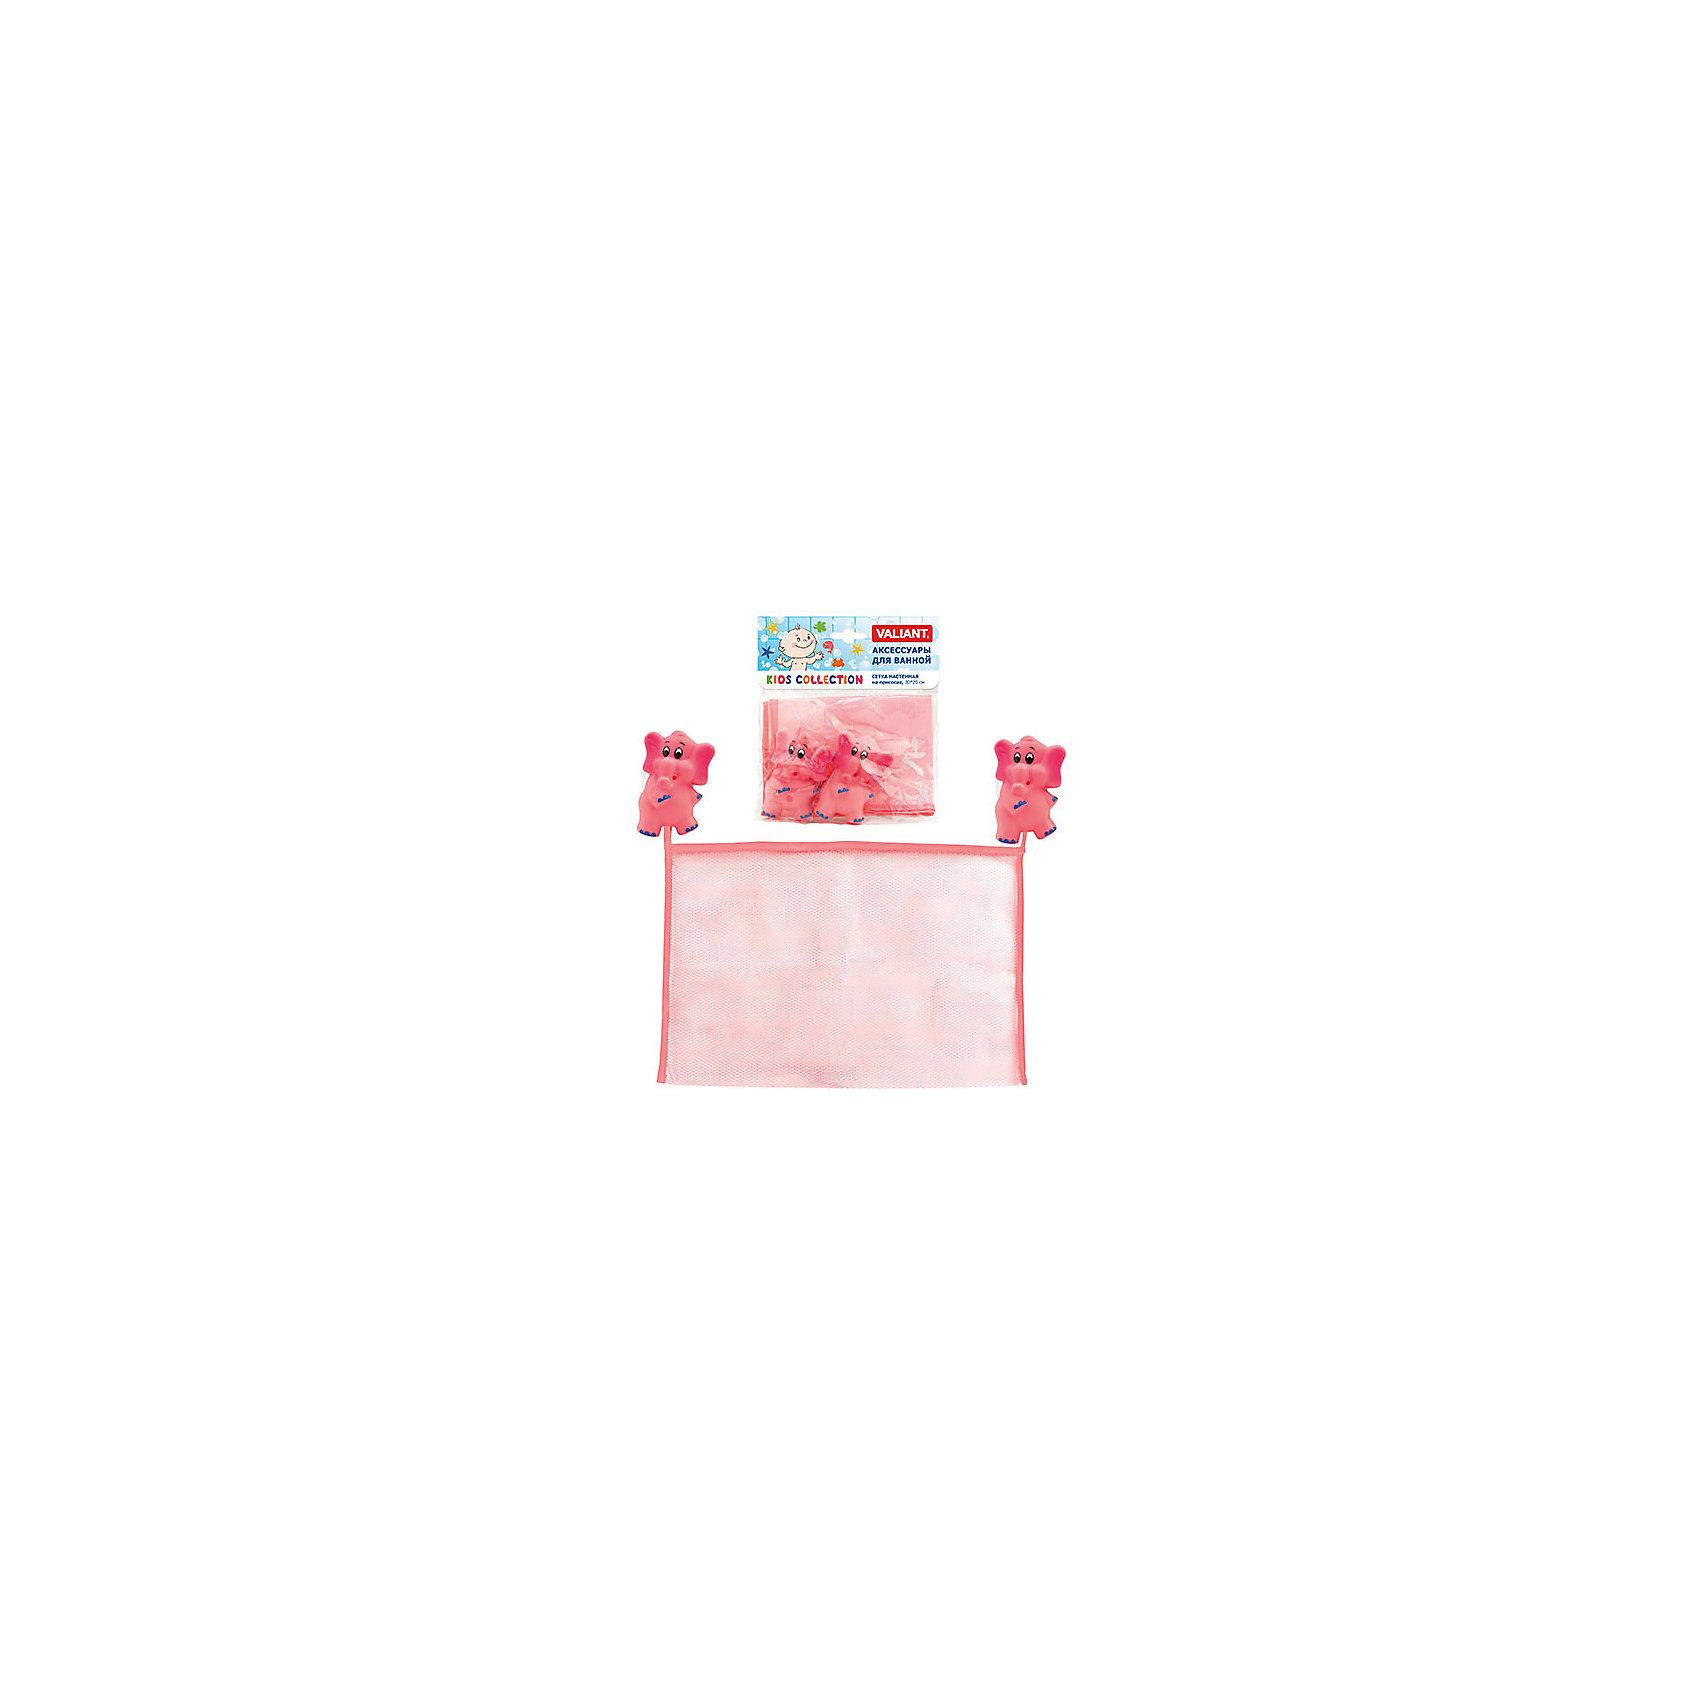 VALIANT Сетка для аксессуаров Слоники 30*20 см valiant коврик для ванны слоники 69 39см